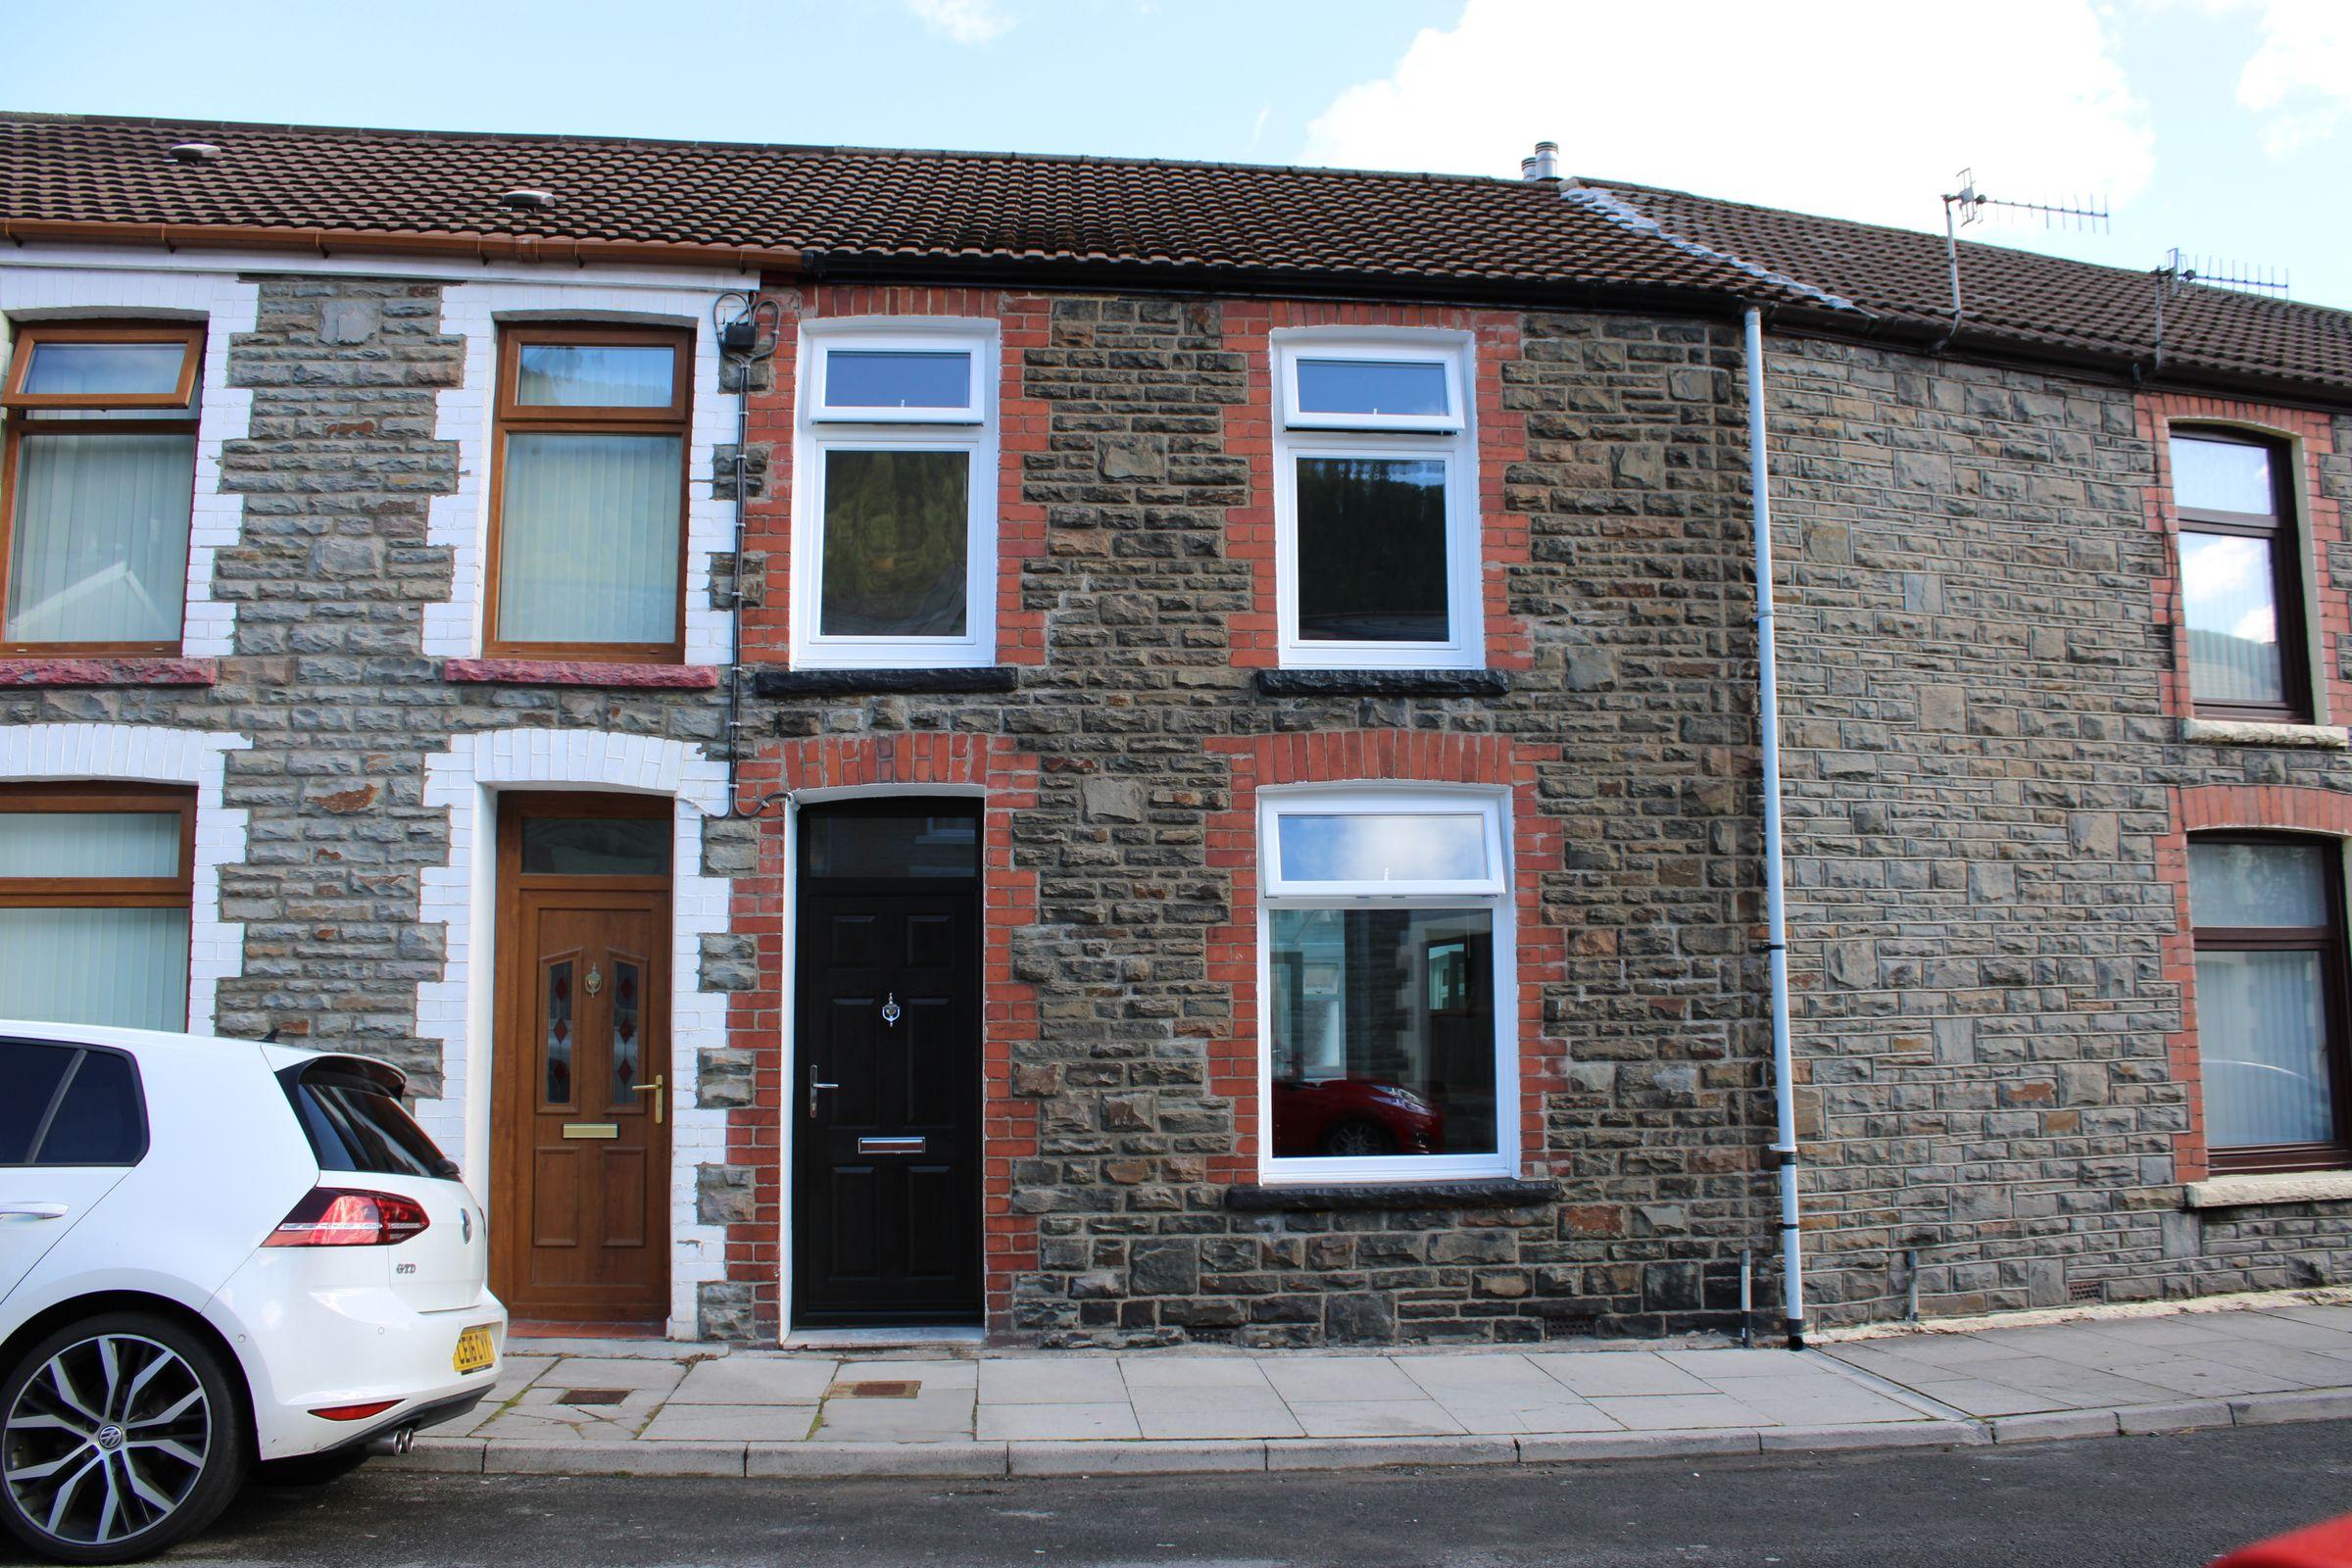 Property photo 1 of 14. Exterior